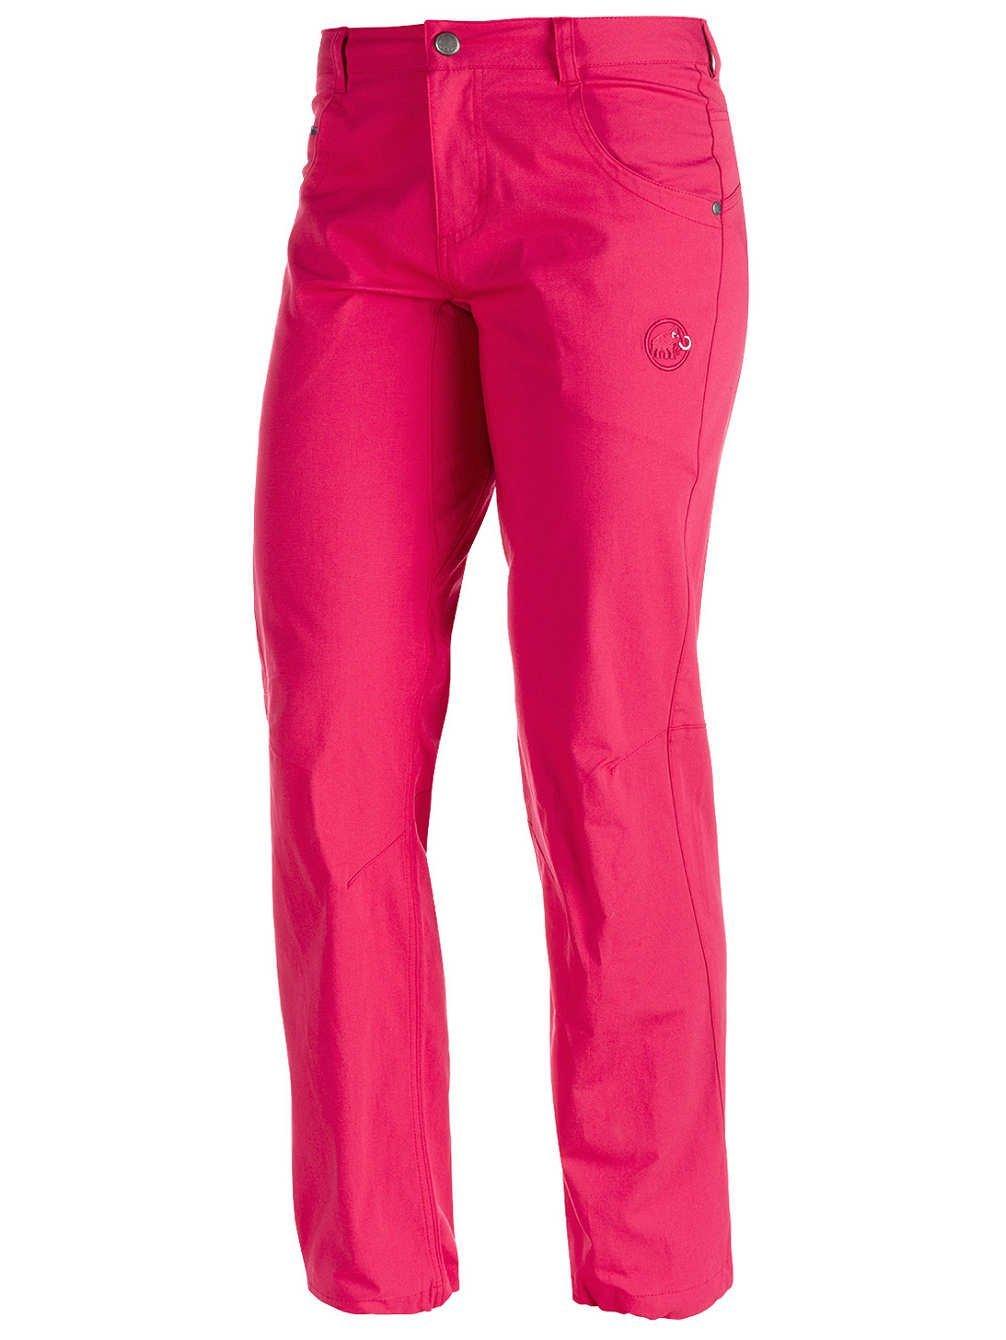 Mammut Hose Ophira - Pantalones para Mujer 1020-08200